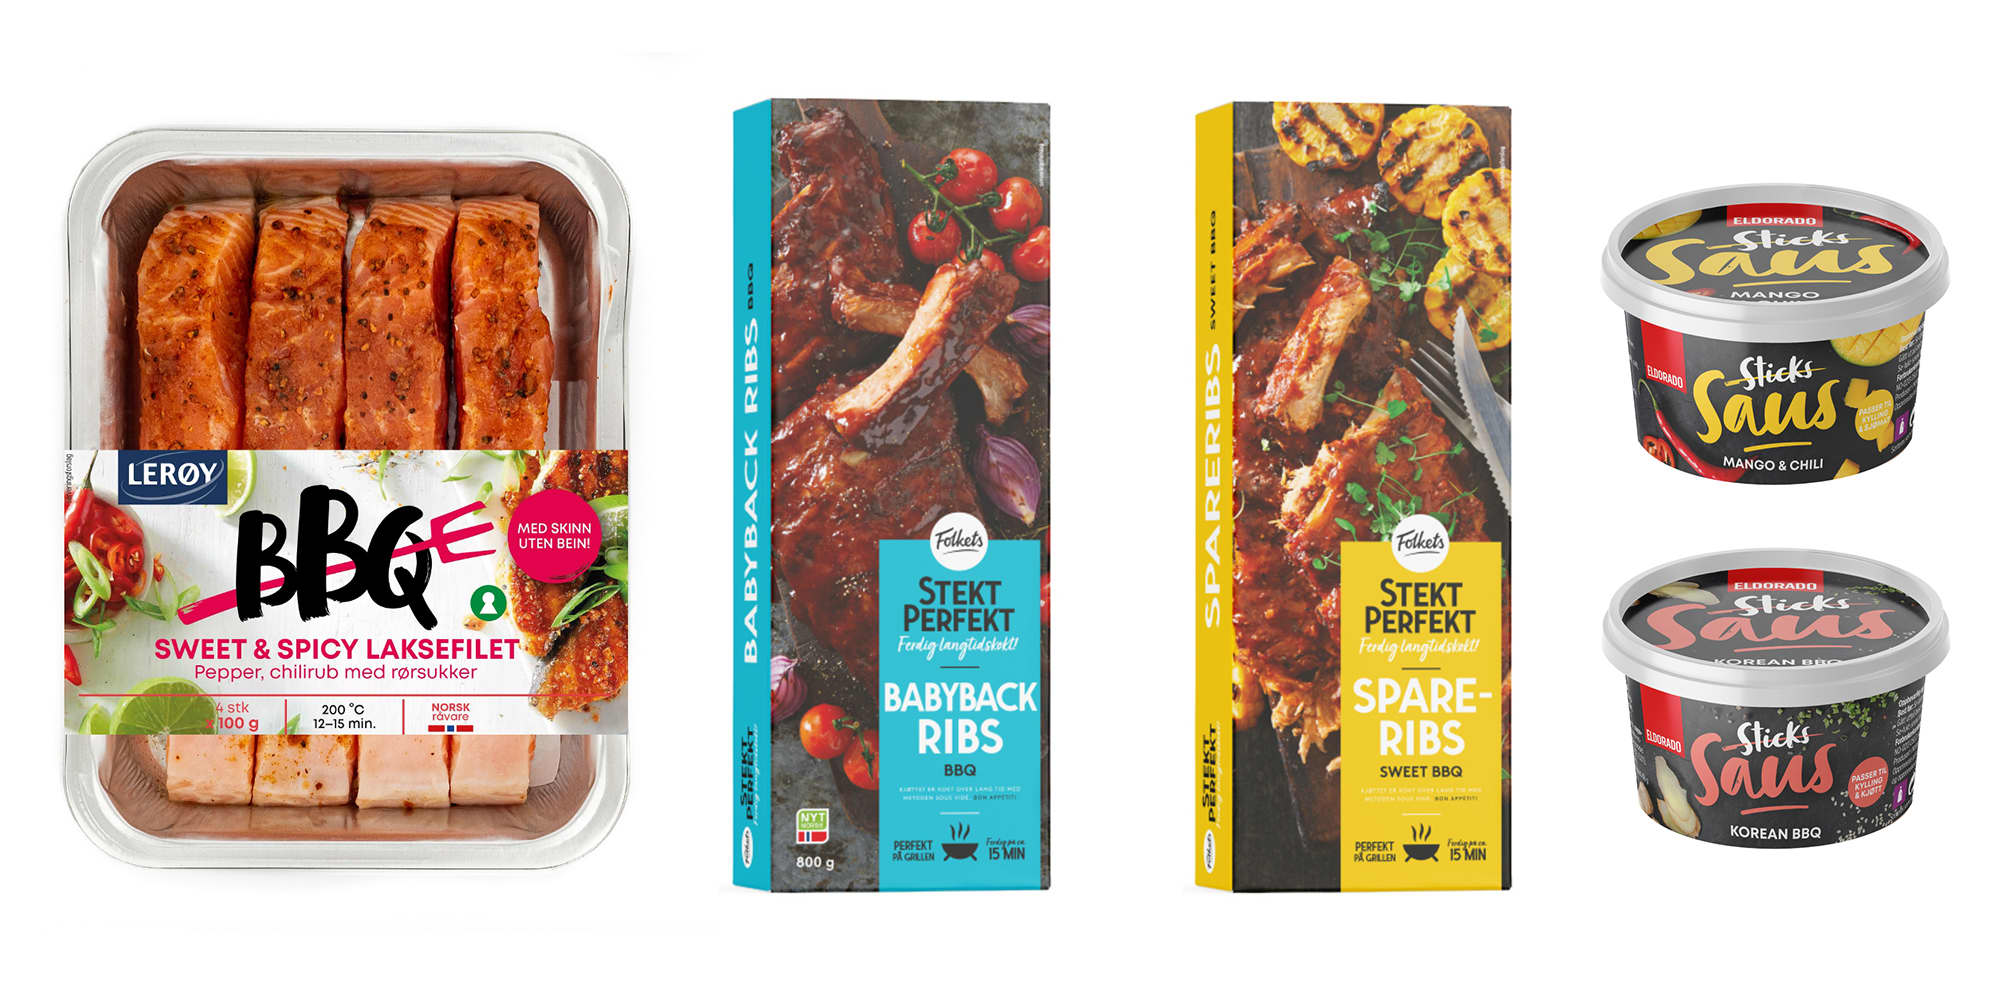 BBQ Sweet & spicy laksefilet, Babyback ribs, Sweet BBQ Spareribs og nye Sticks-sauser.